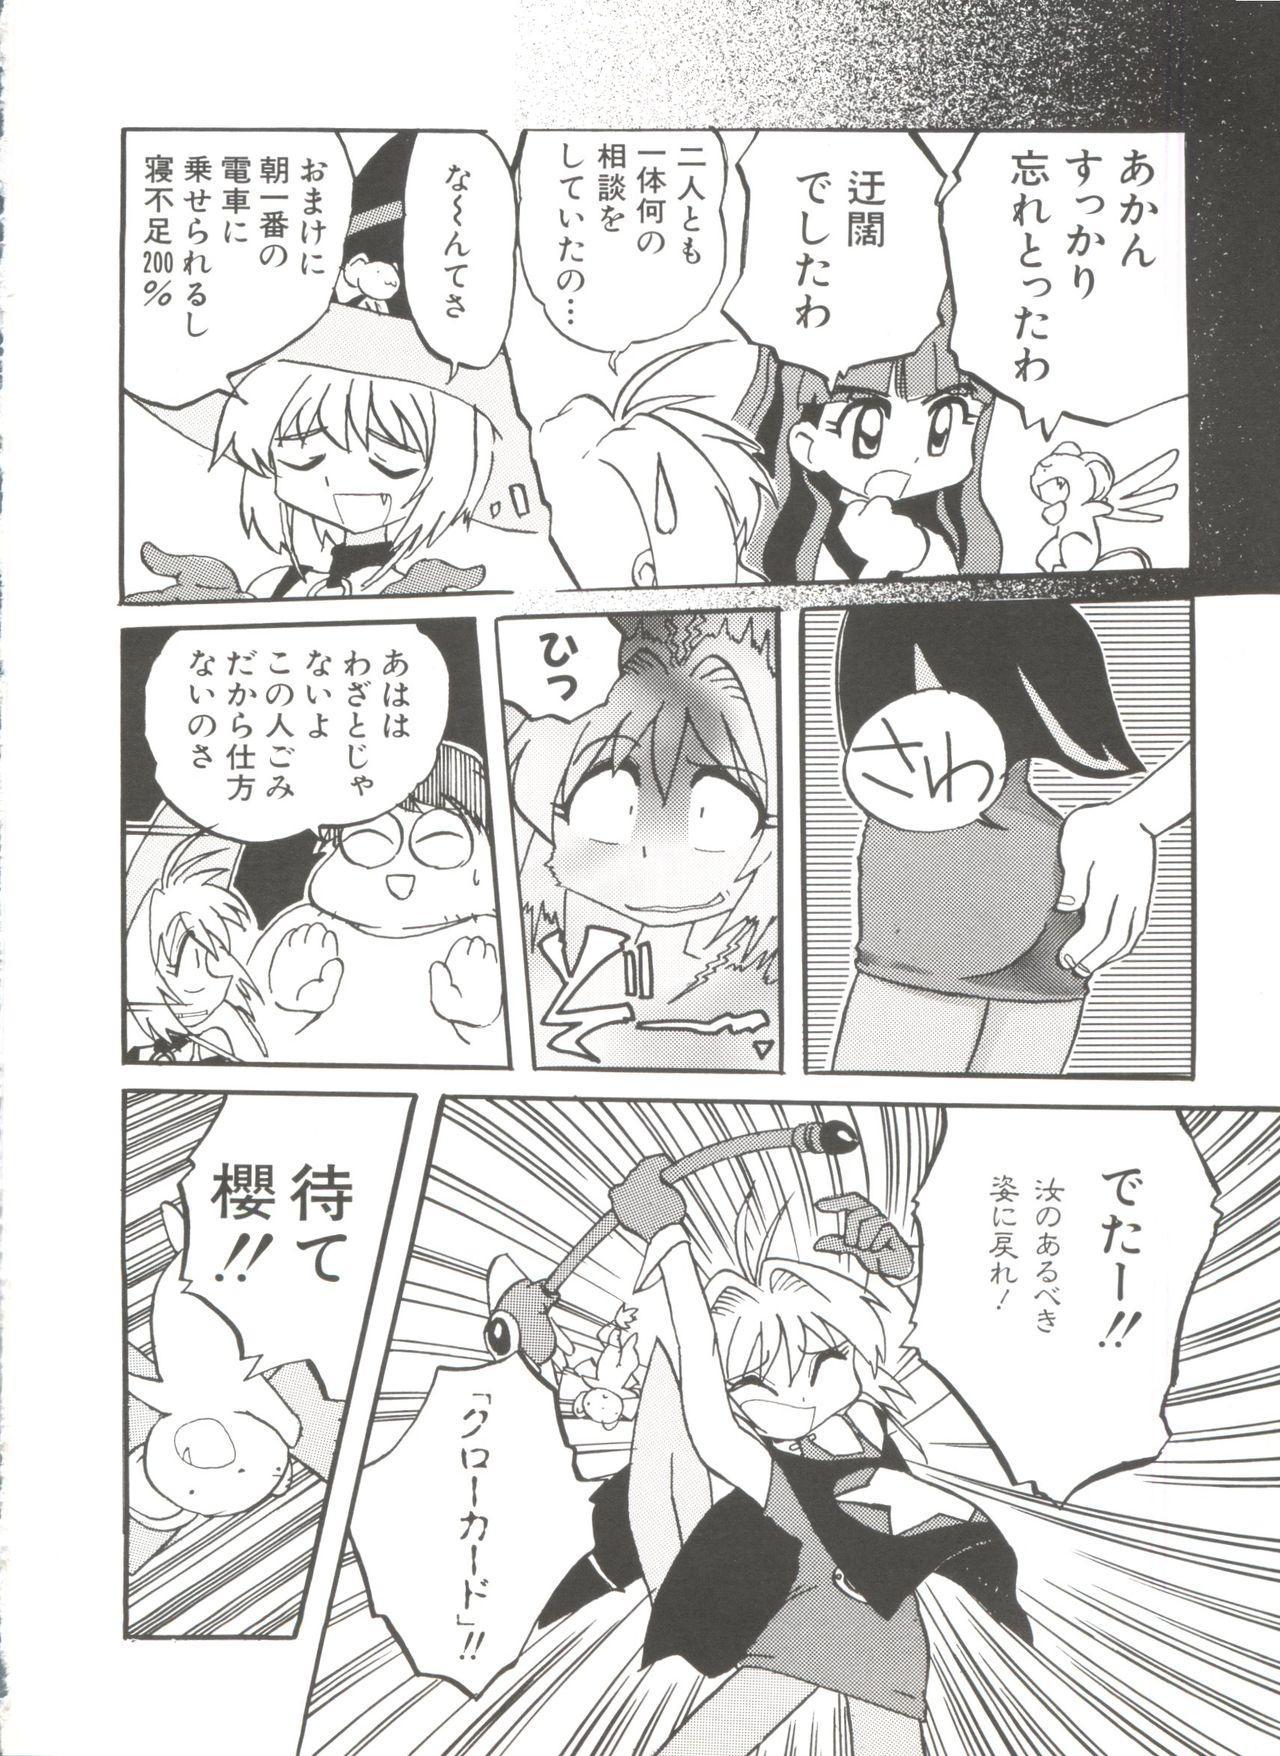 [Anthology] Denei Tamatebako 8 - Utakata no Tenshi-tachi II (Various) 115